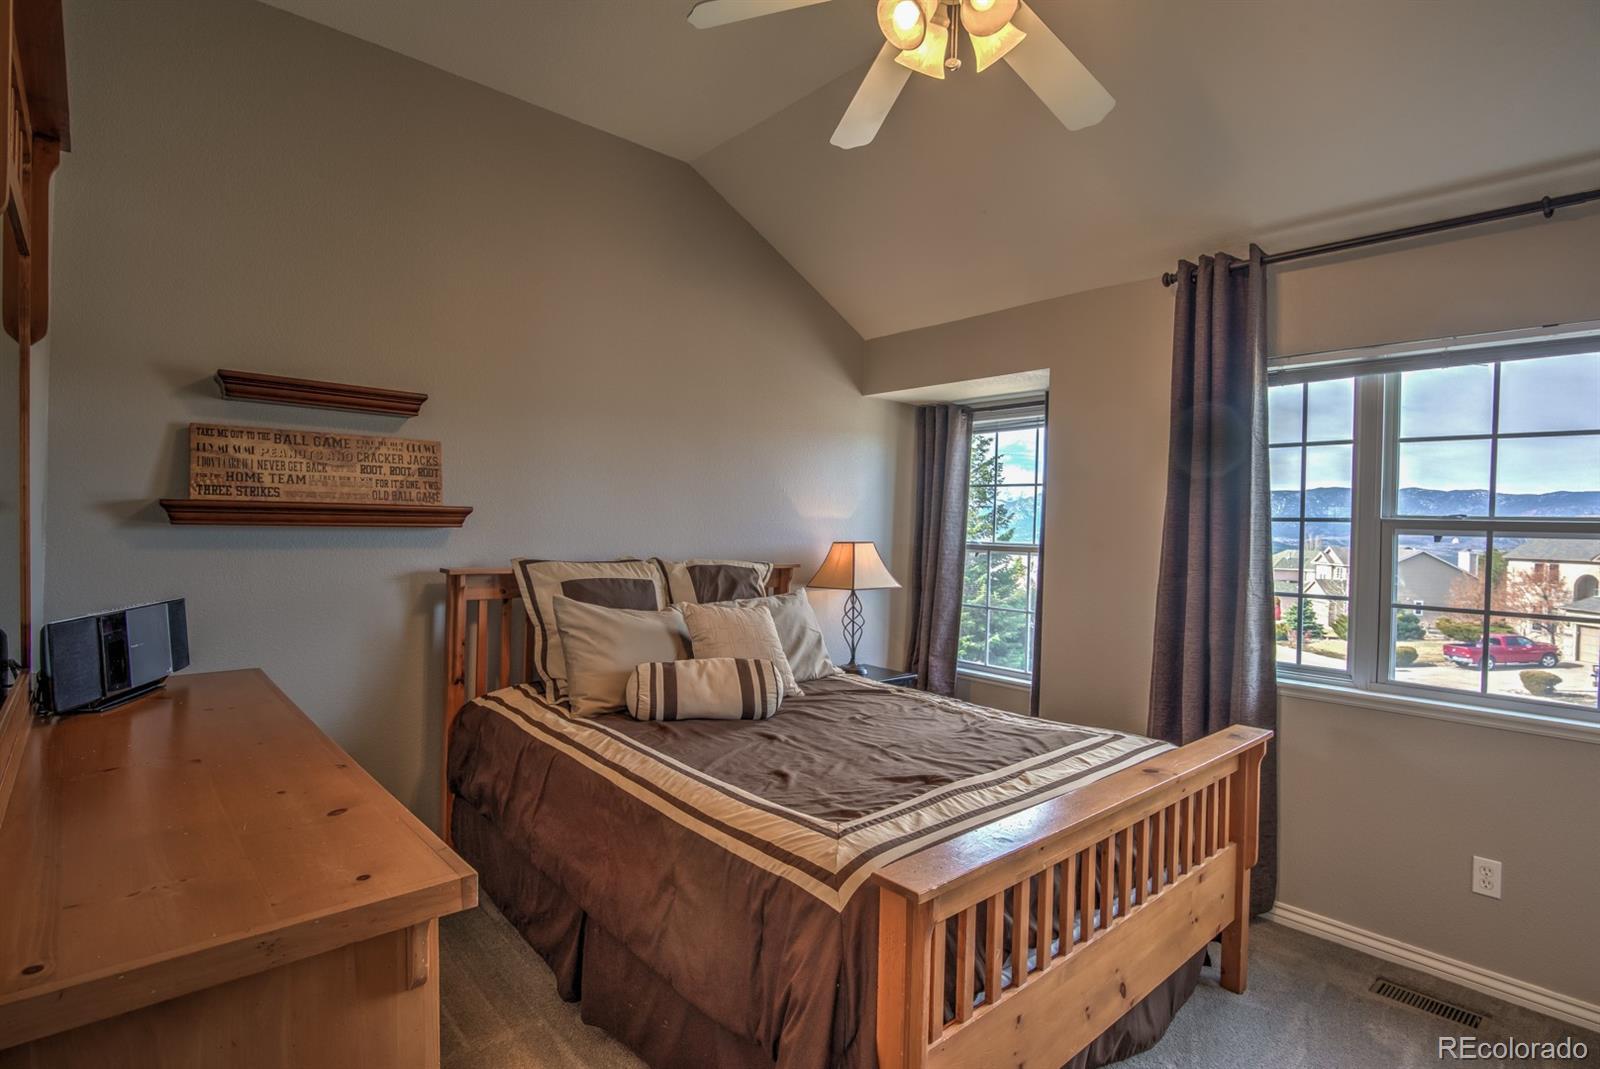 MLS# 7867088 - 19 - 15445 Curwood Drive, Colorado Springs, CO 80921